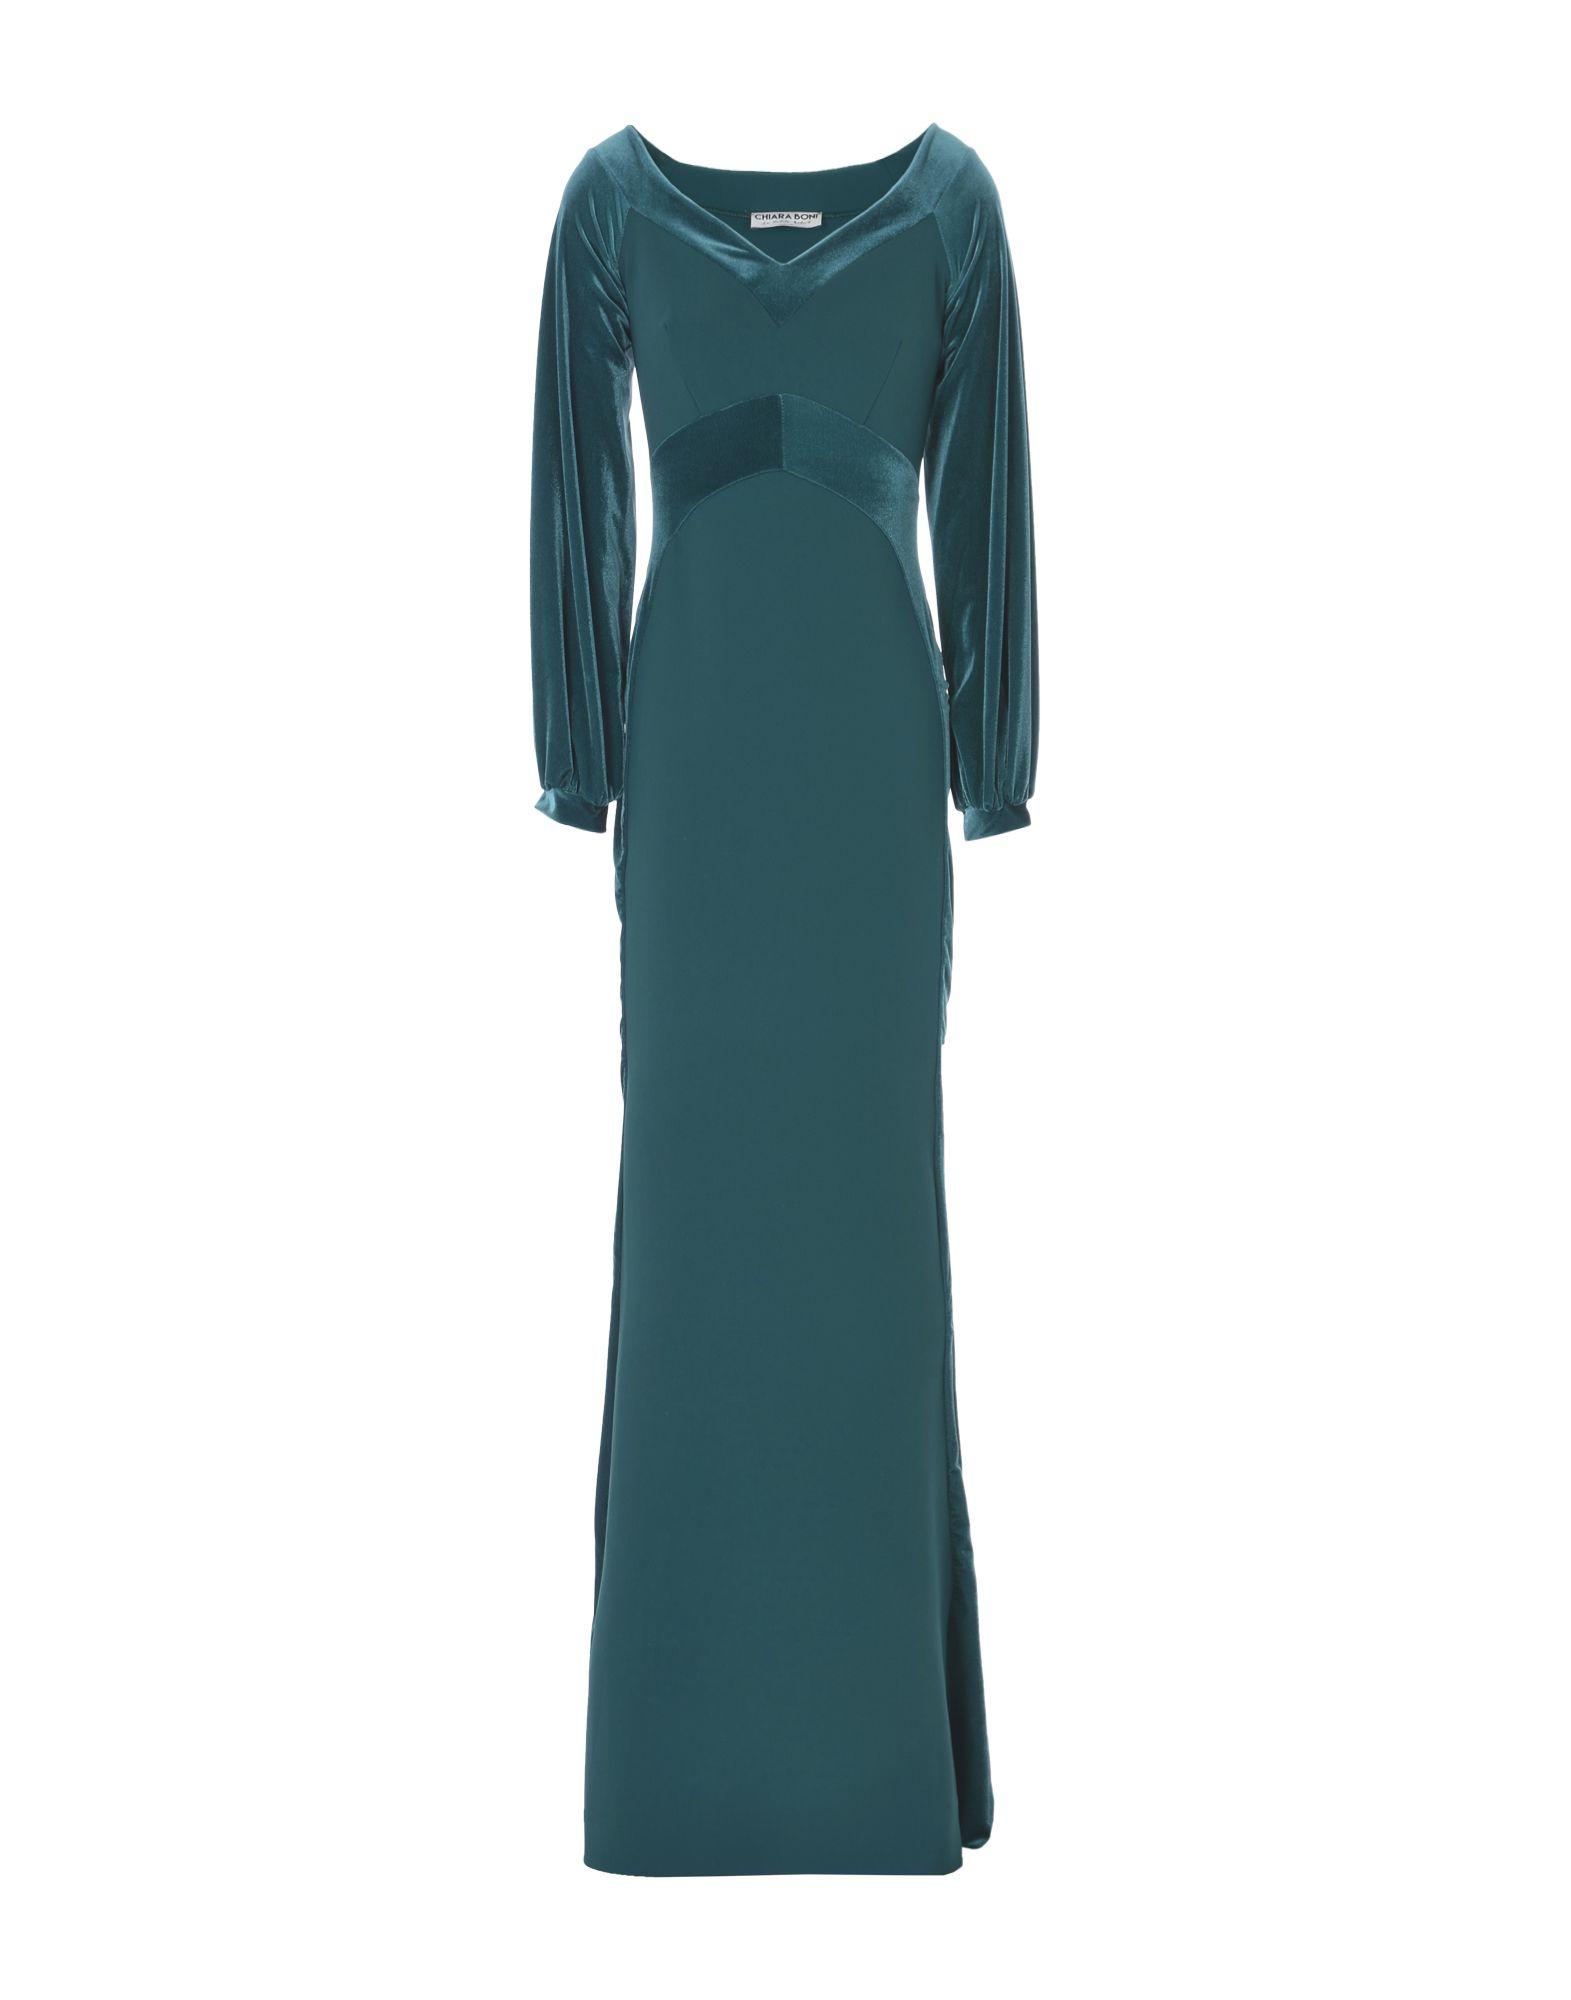 63e9ef3d751 Chiara Boni La Petite Robe Long Dress - Women Chiara Boni La Petite ...